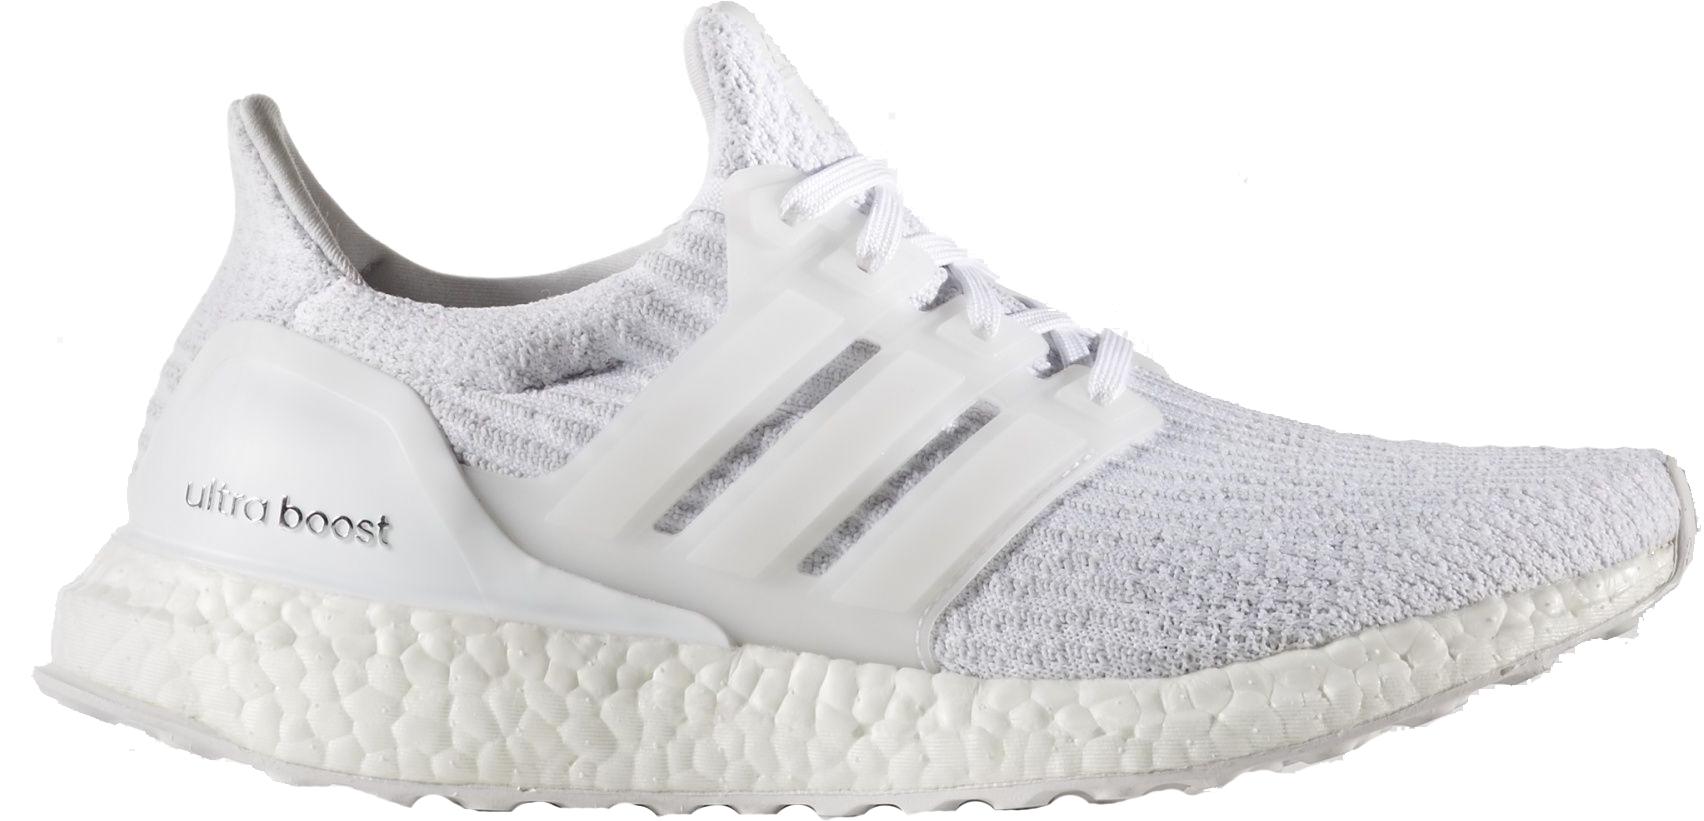 adidas Ultra Boost 3.0 Triple White (W)